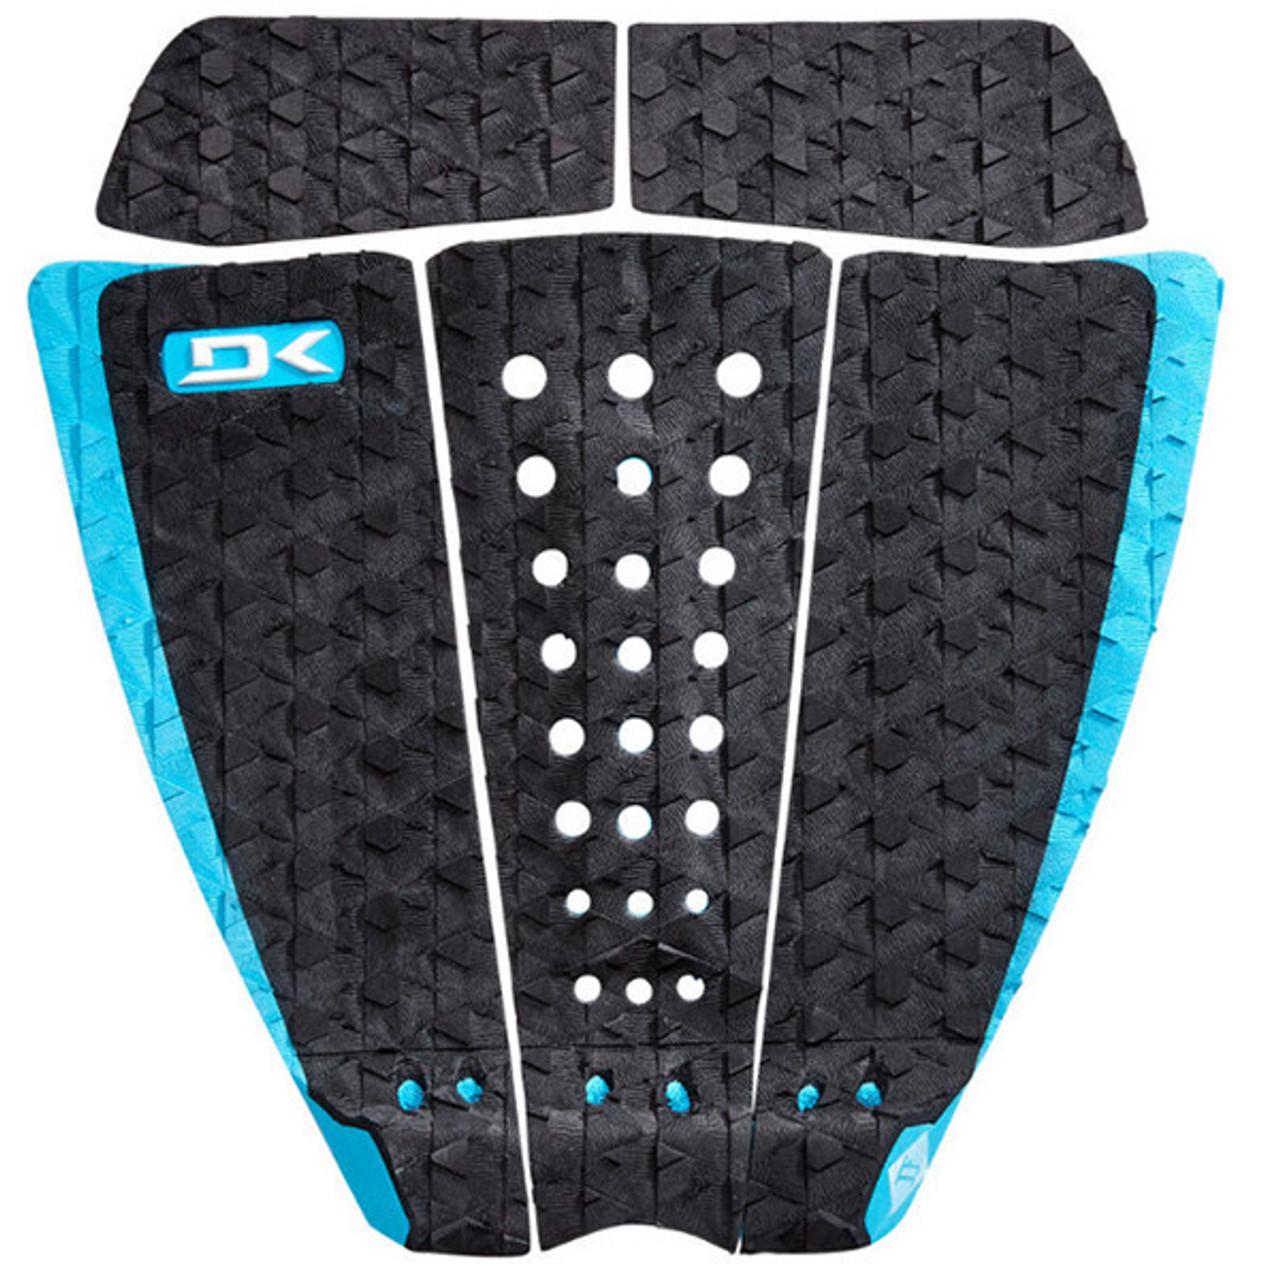 1008dfb20121 John John Florence Tail Pad | Blue/ Black | Surfboard Deck Grip | Surfing  Traction Pad - Surf Shops Australia